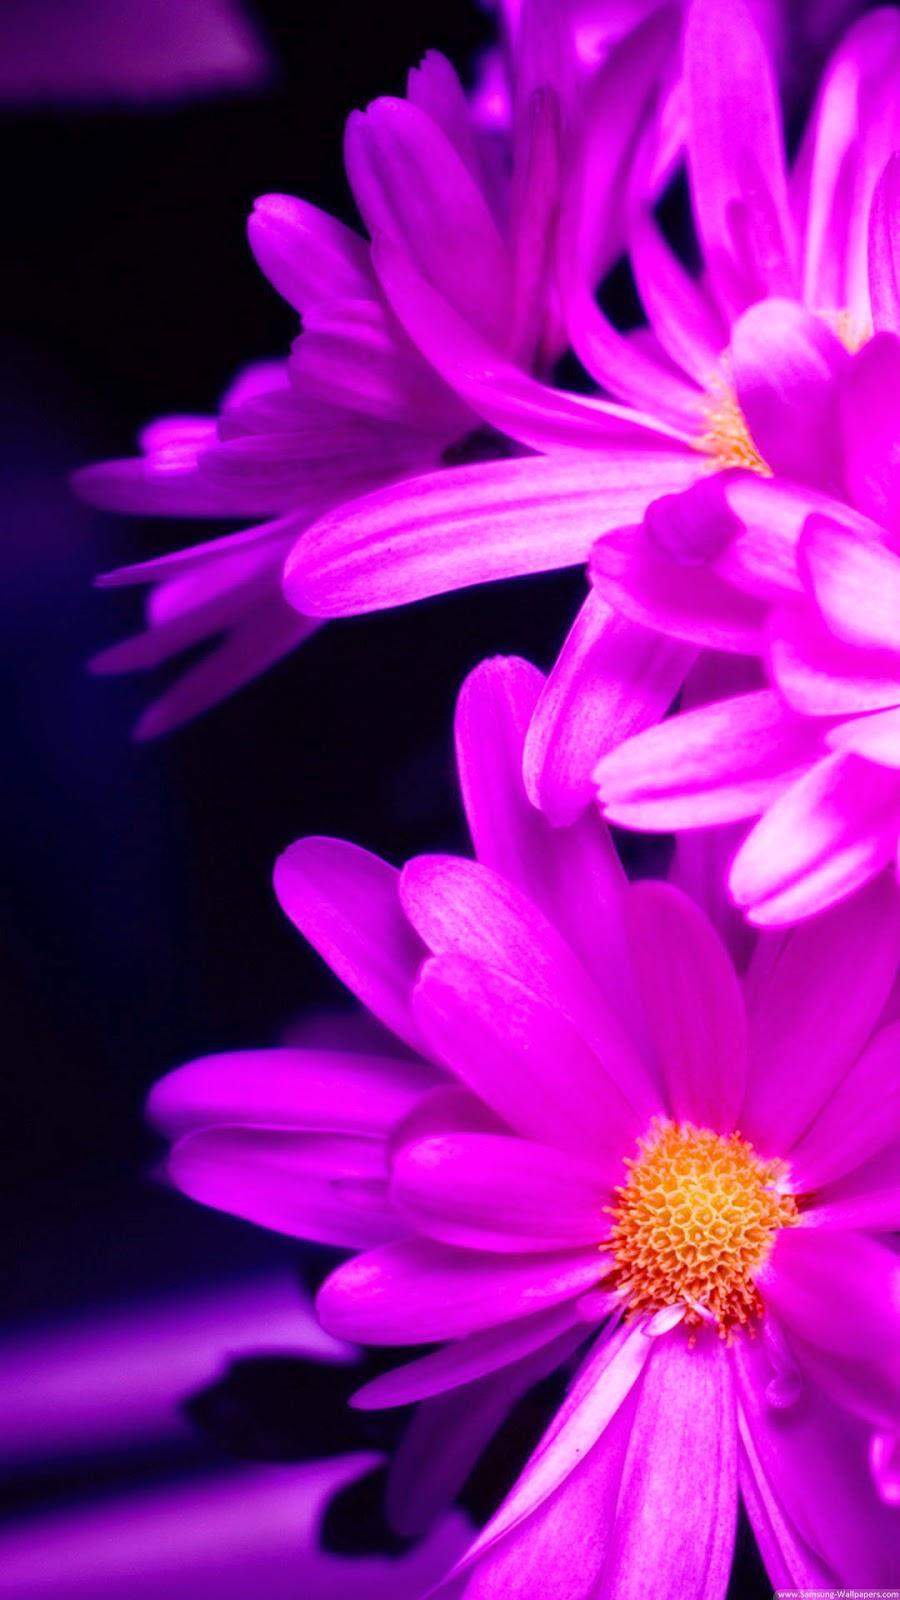 Flower Wallpapers Iphone 6 900x1600 Download Hd Wallpaper Wallpapertip